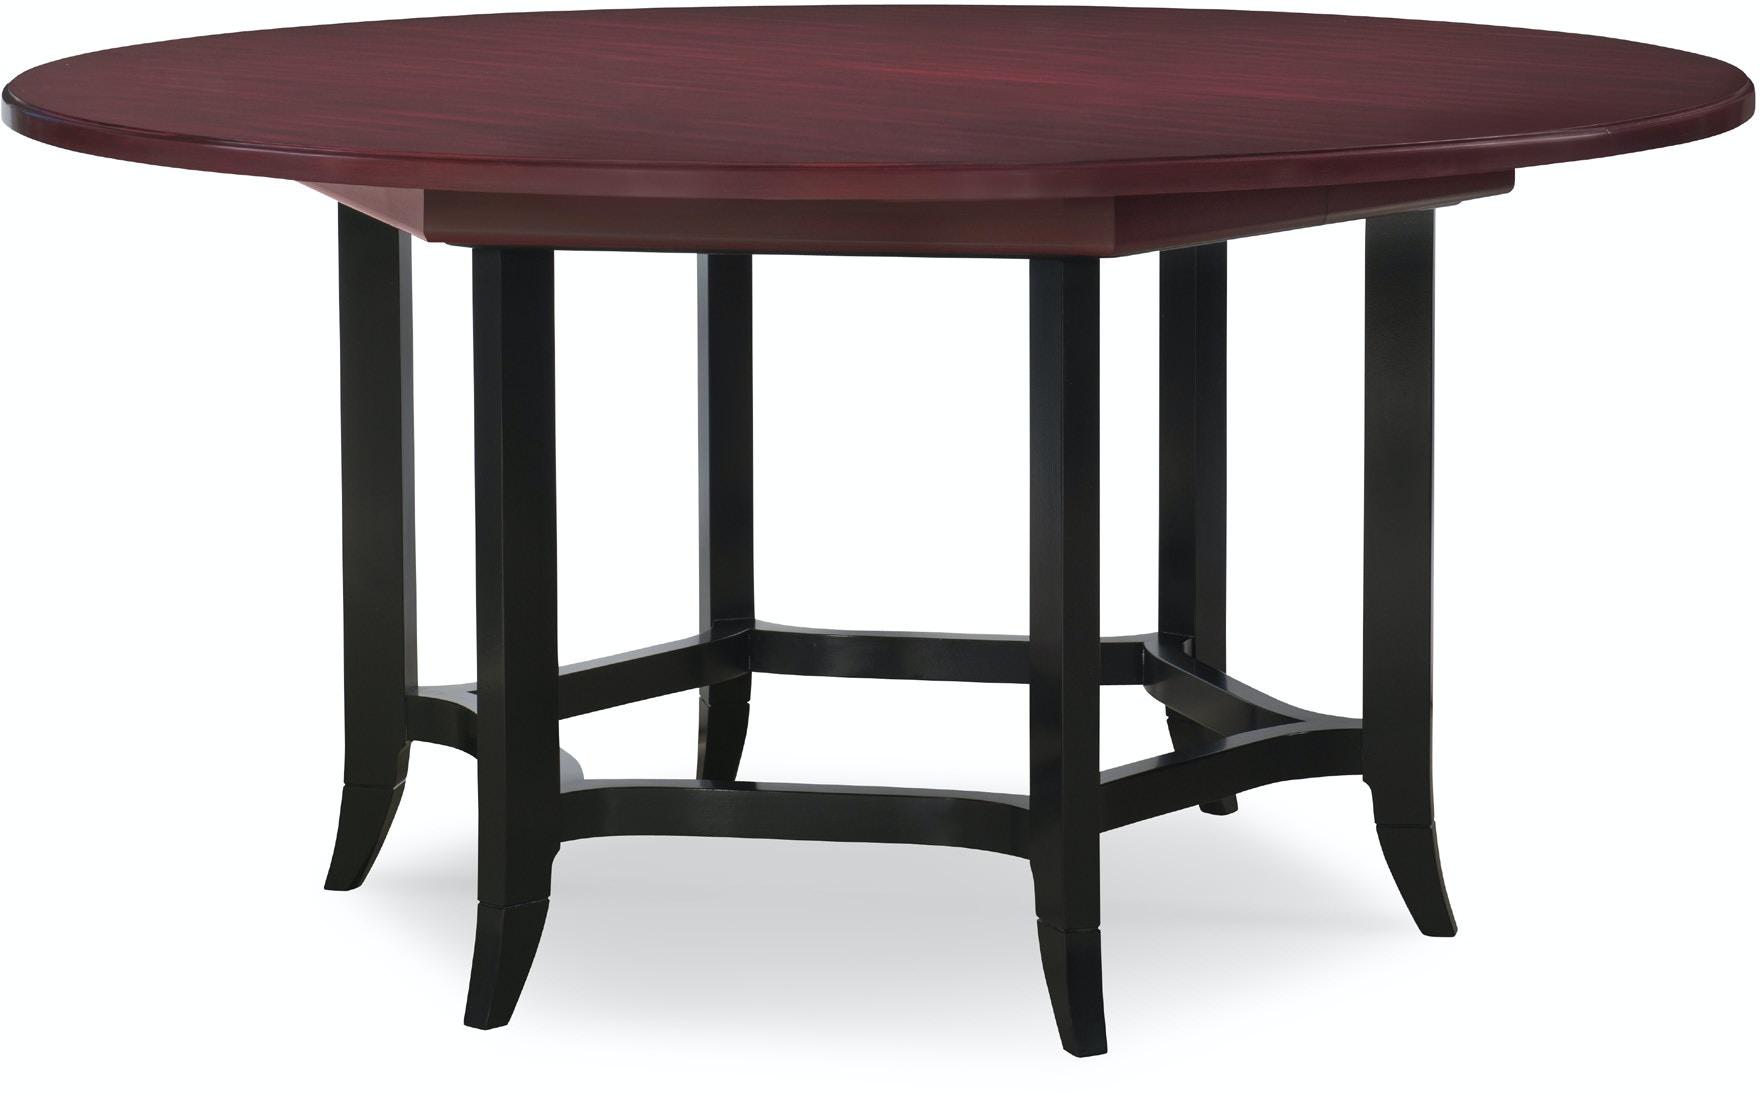 Luxury Henkel Harris Furniture New Witsolutcom : 440v 5 from witsolut.com size 1760 x 1094 jpeg 58kB